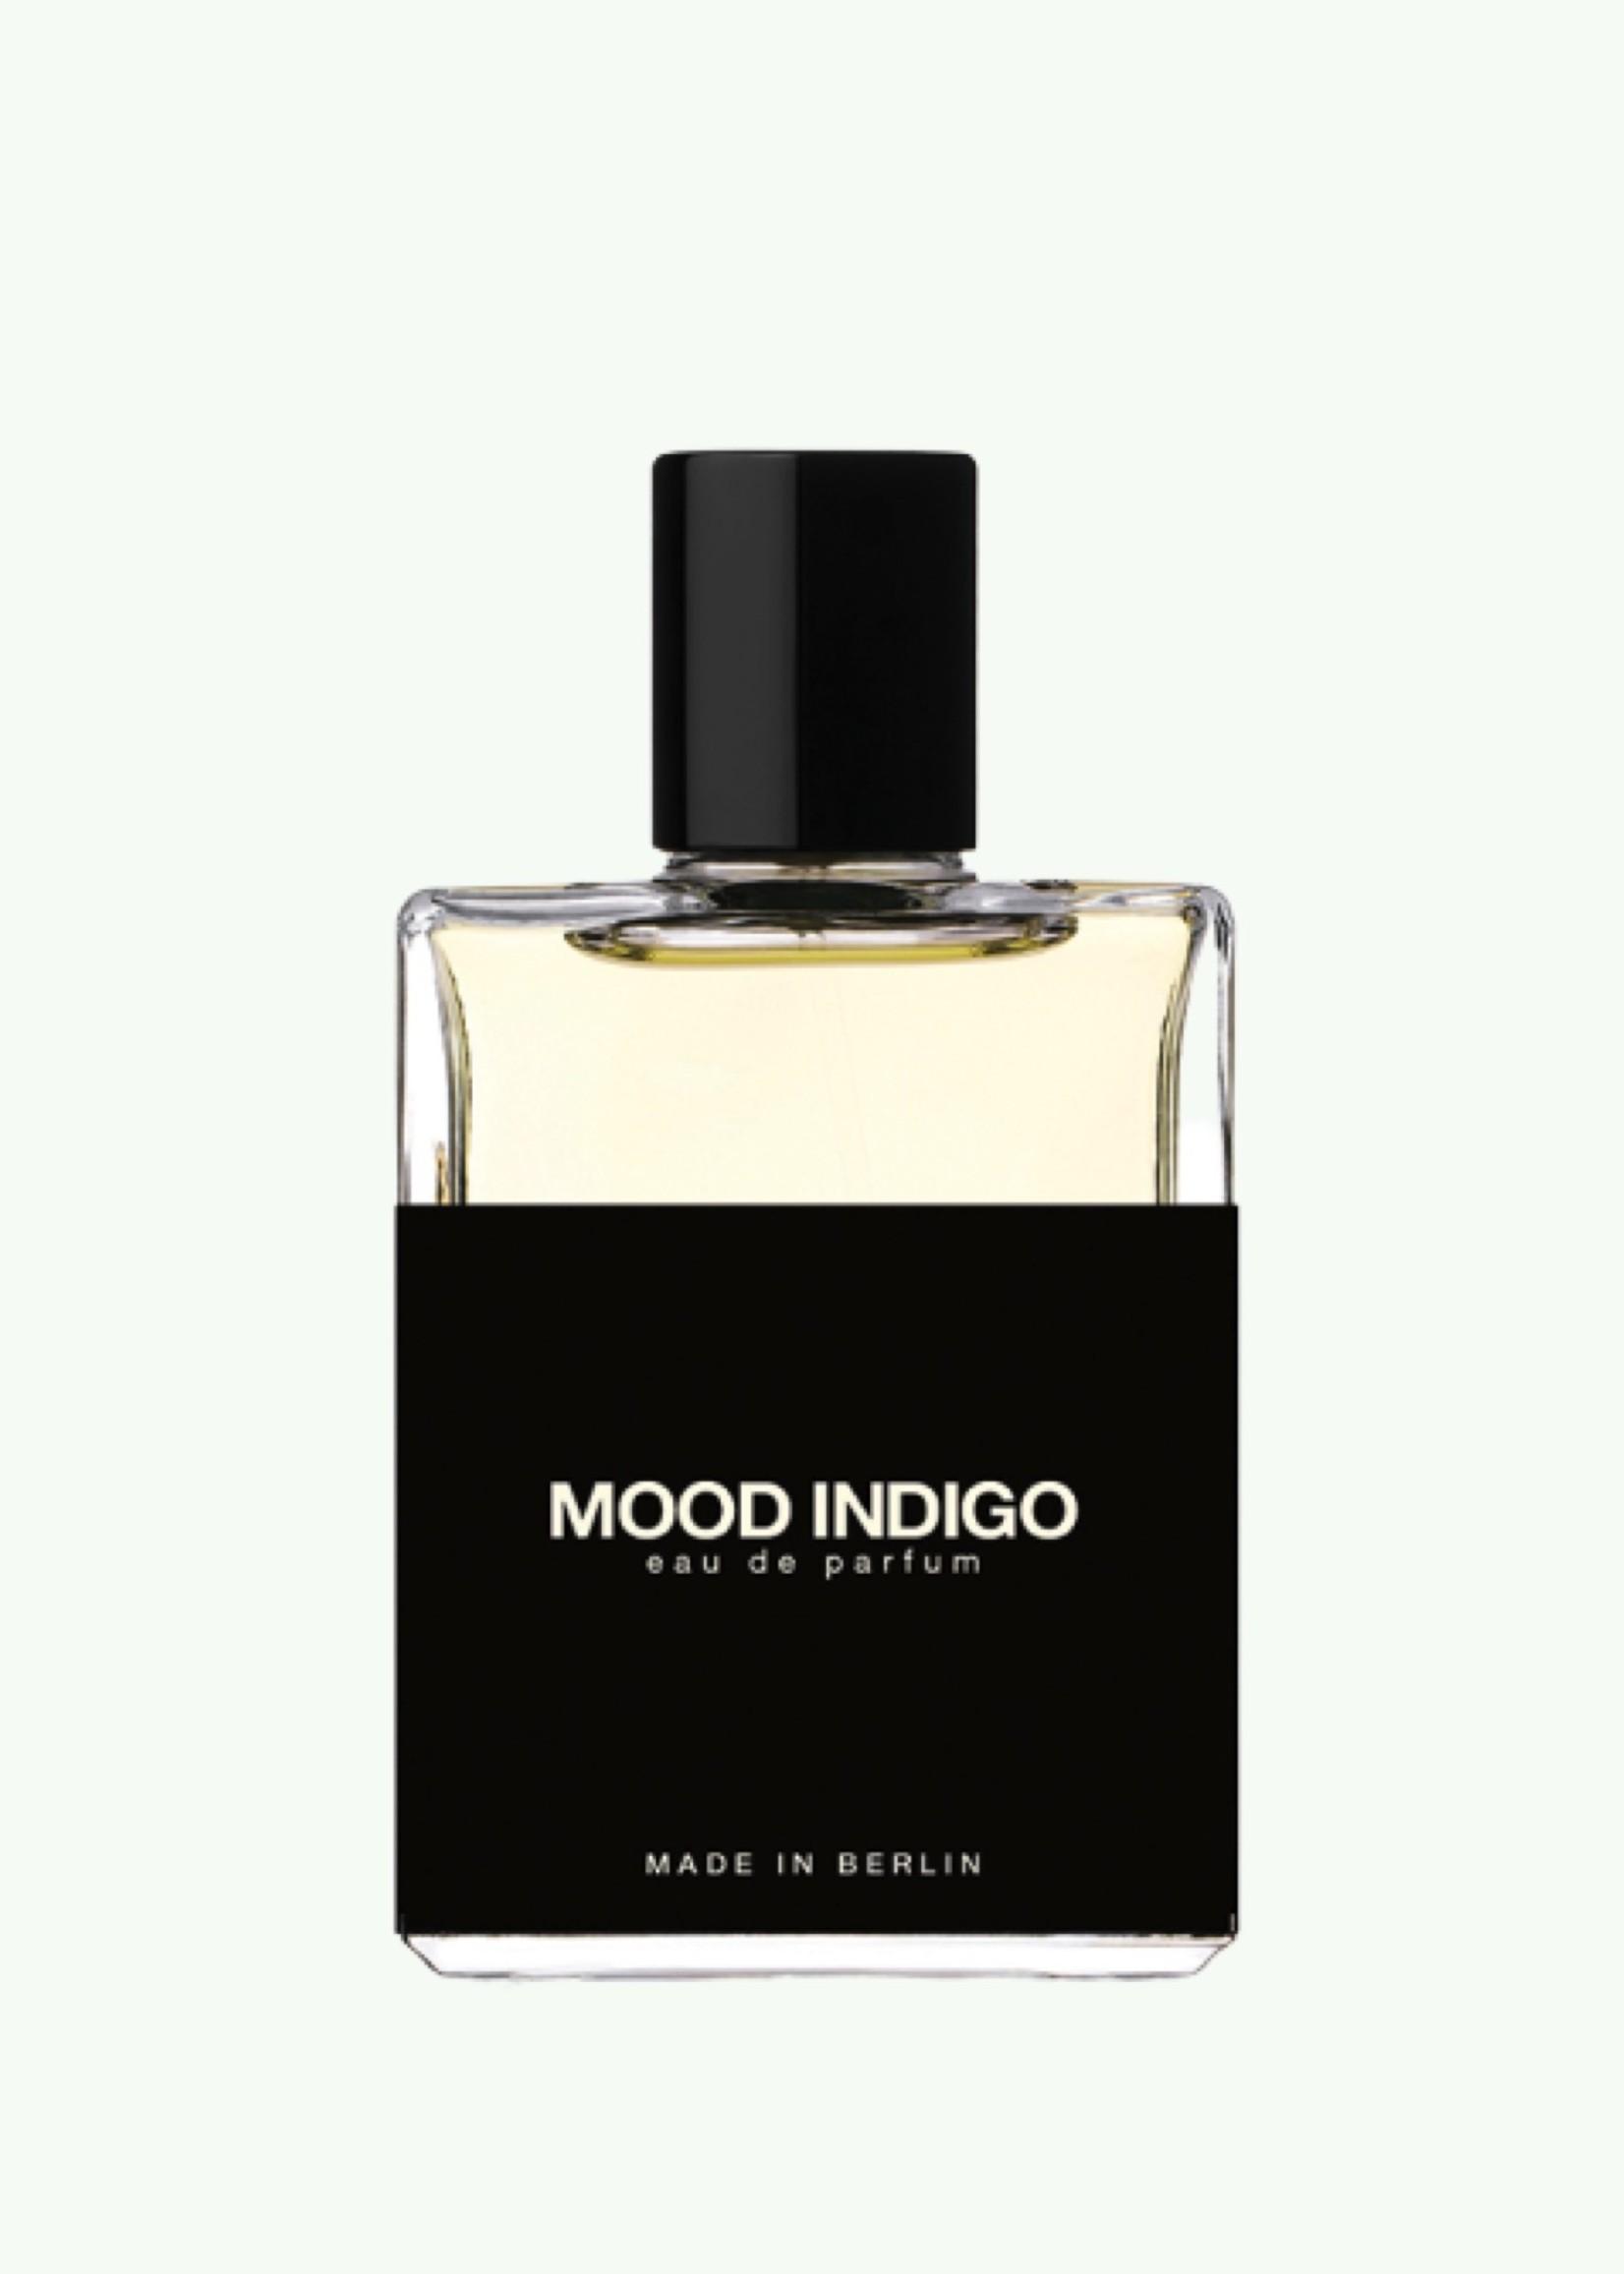 Moth and Rabbit Moth and Rabbit - Mood Indigo - Eau de Parfum